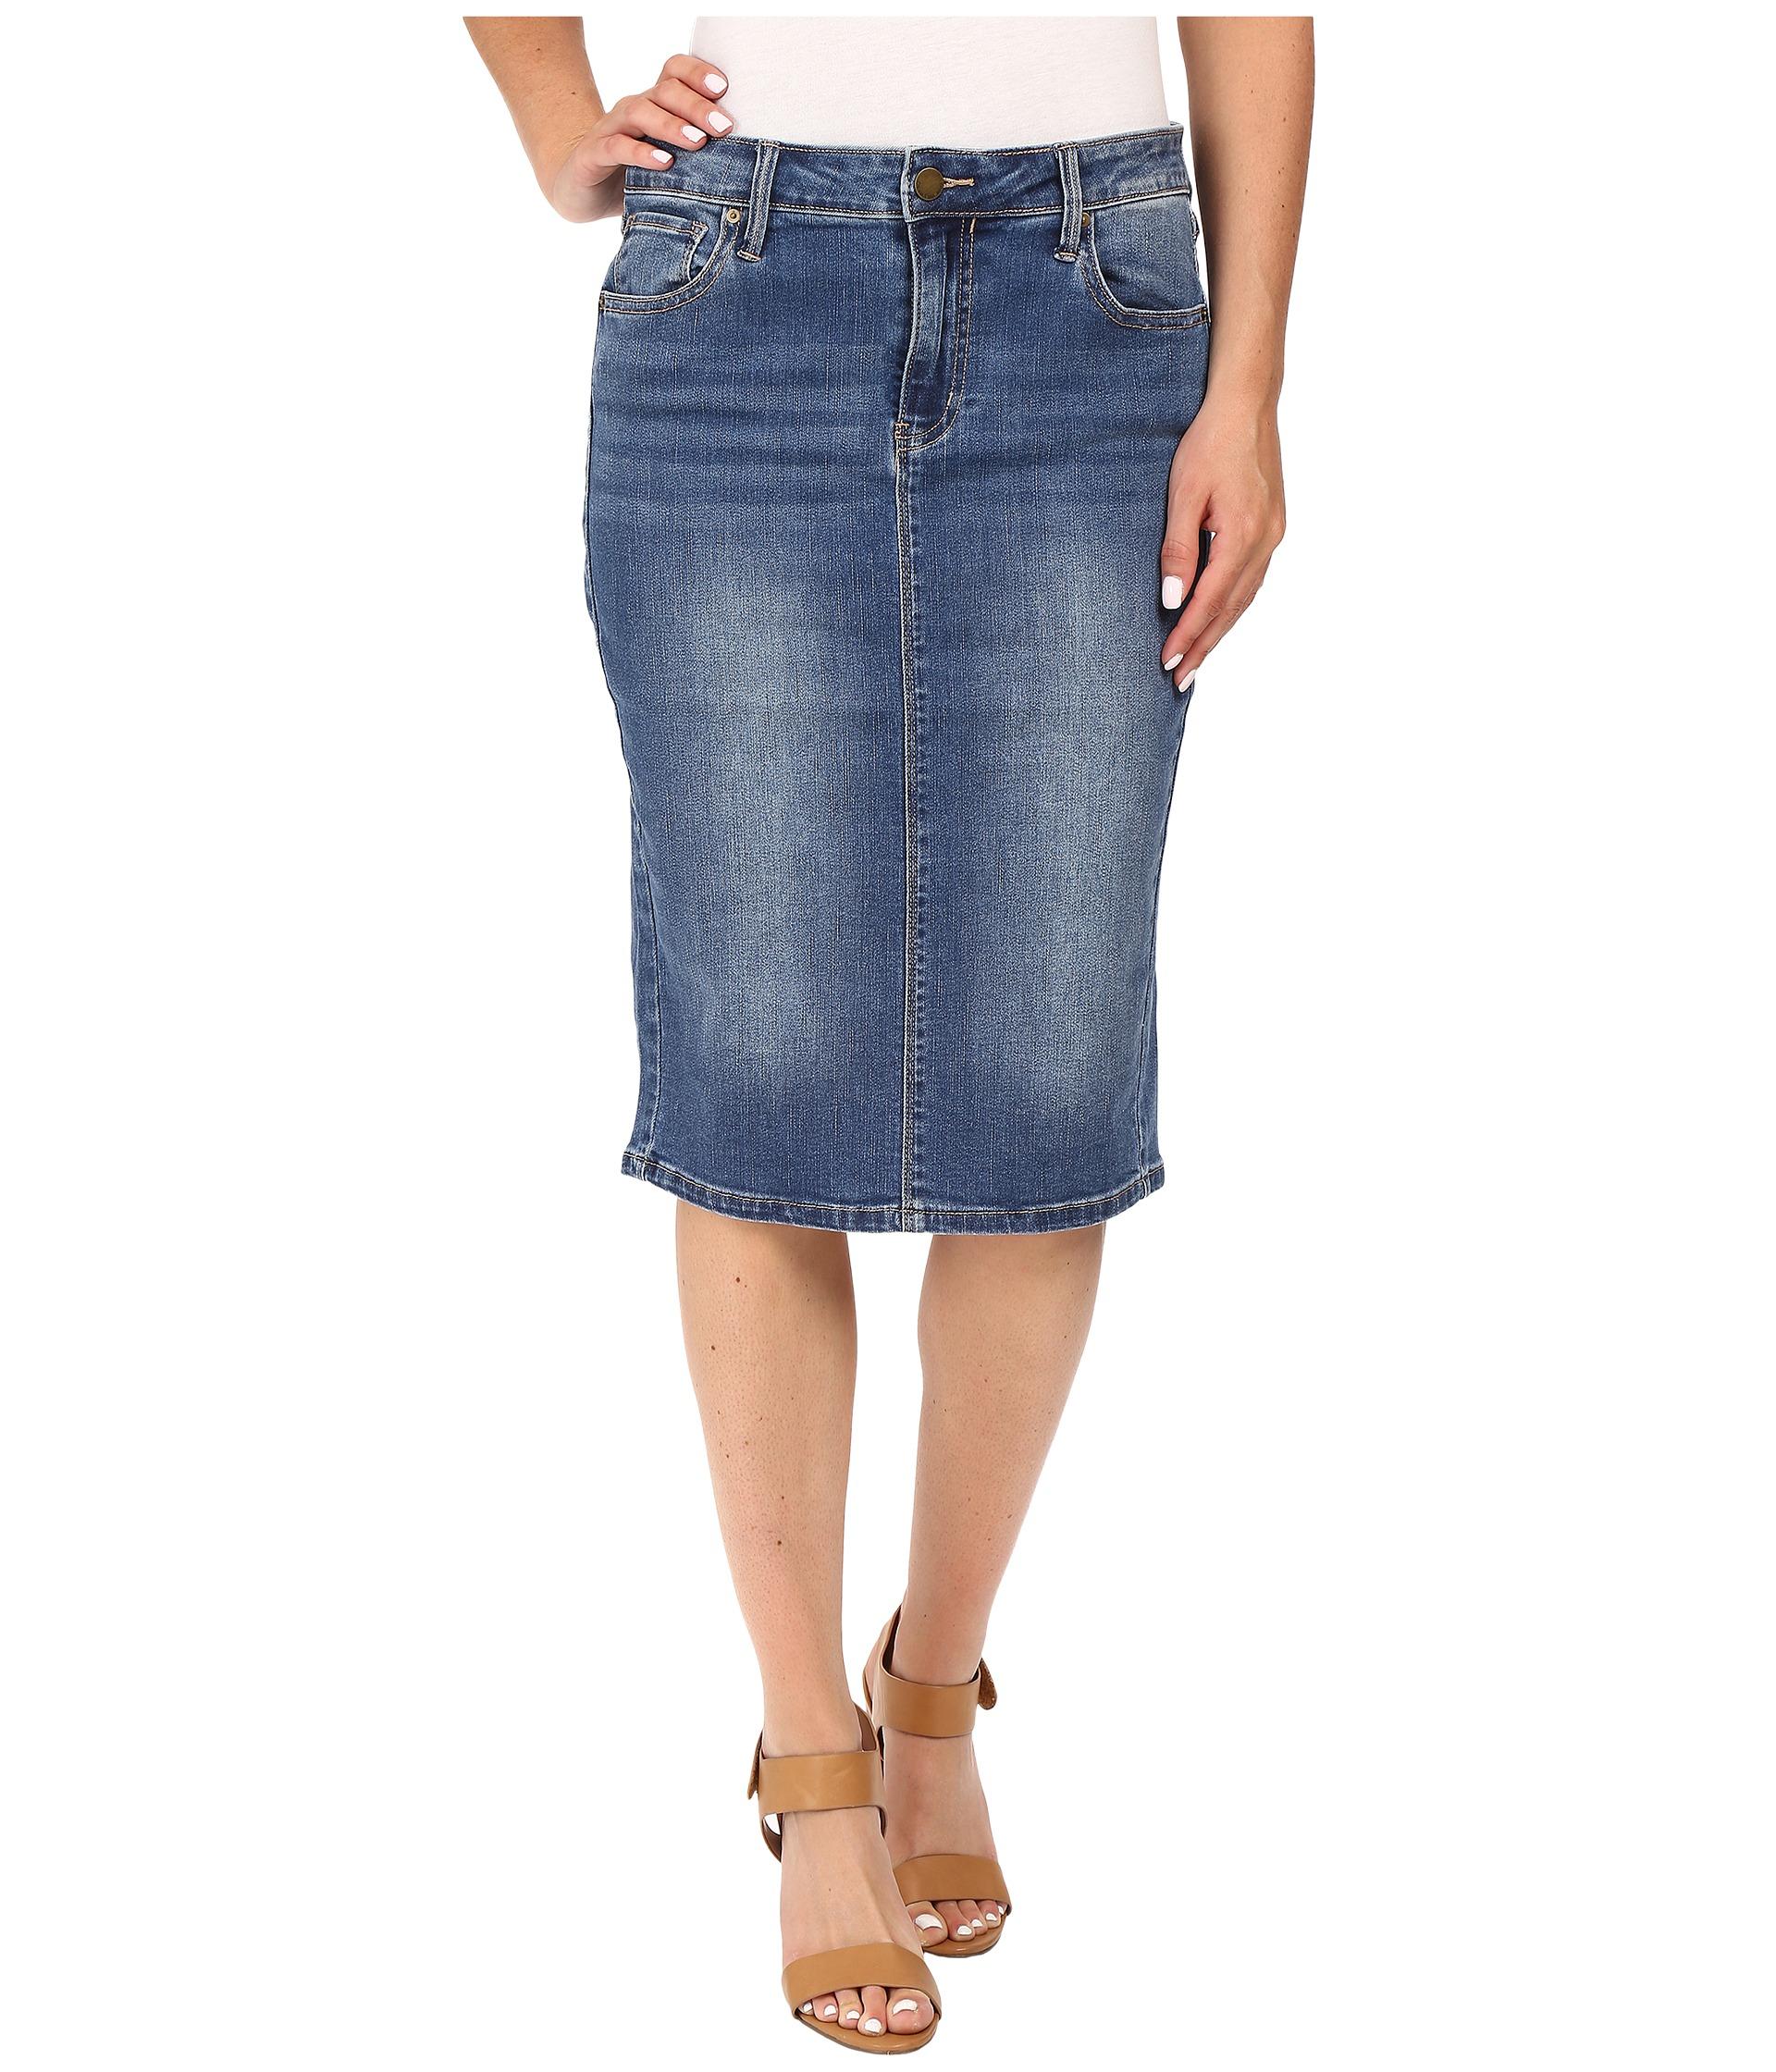 calvin klein essential pencil skirt zappos